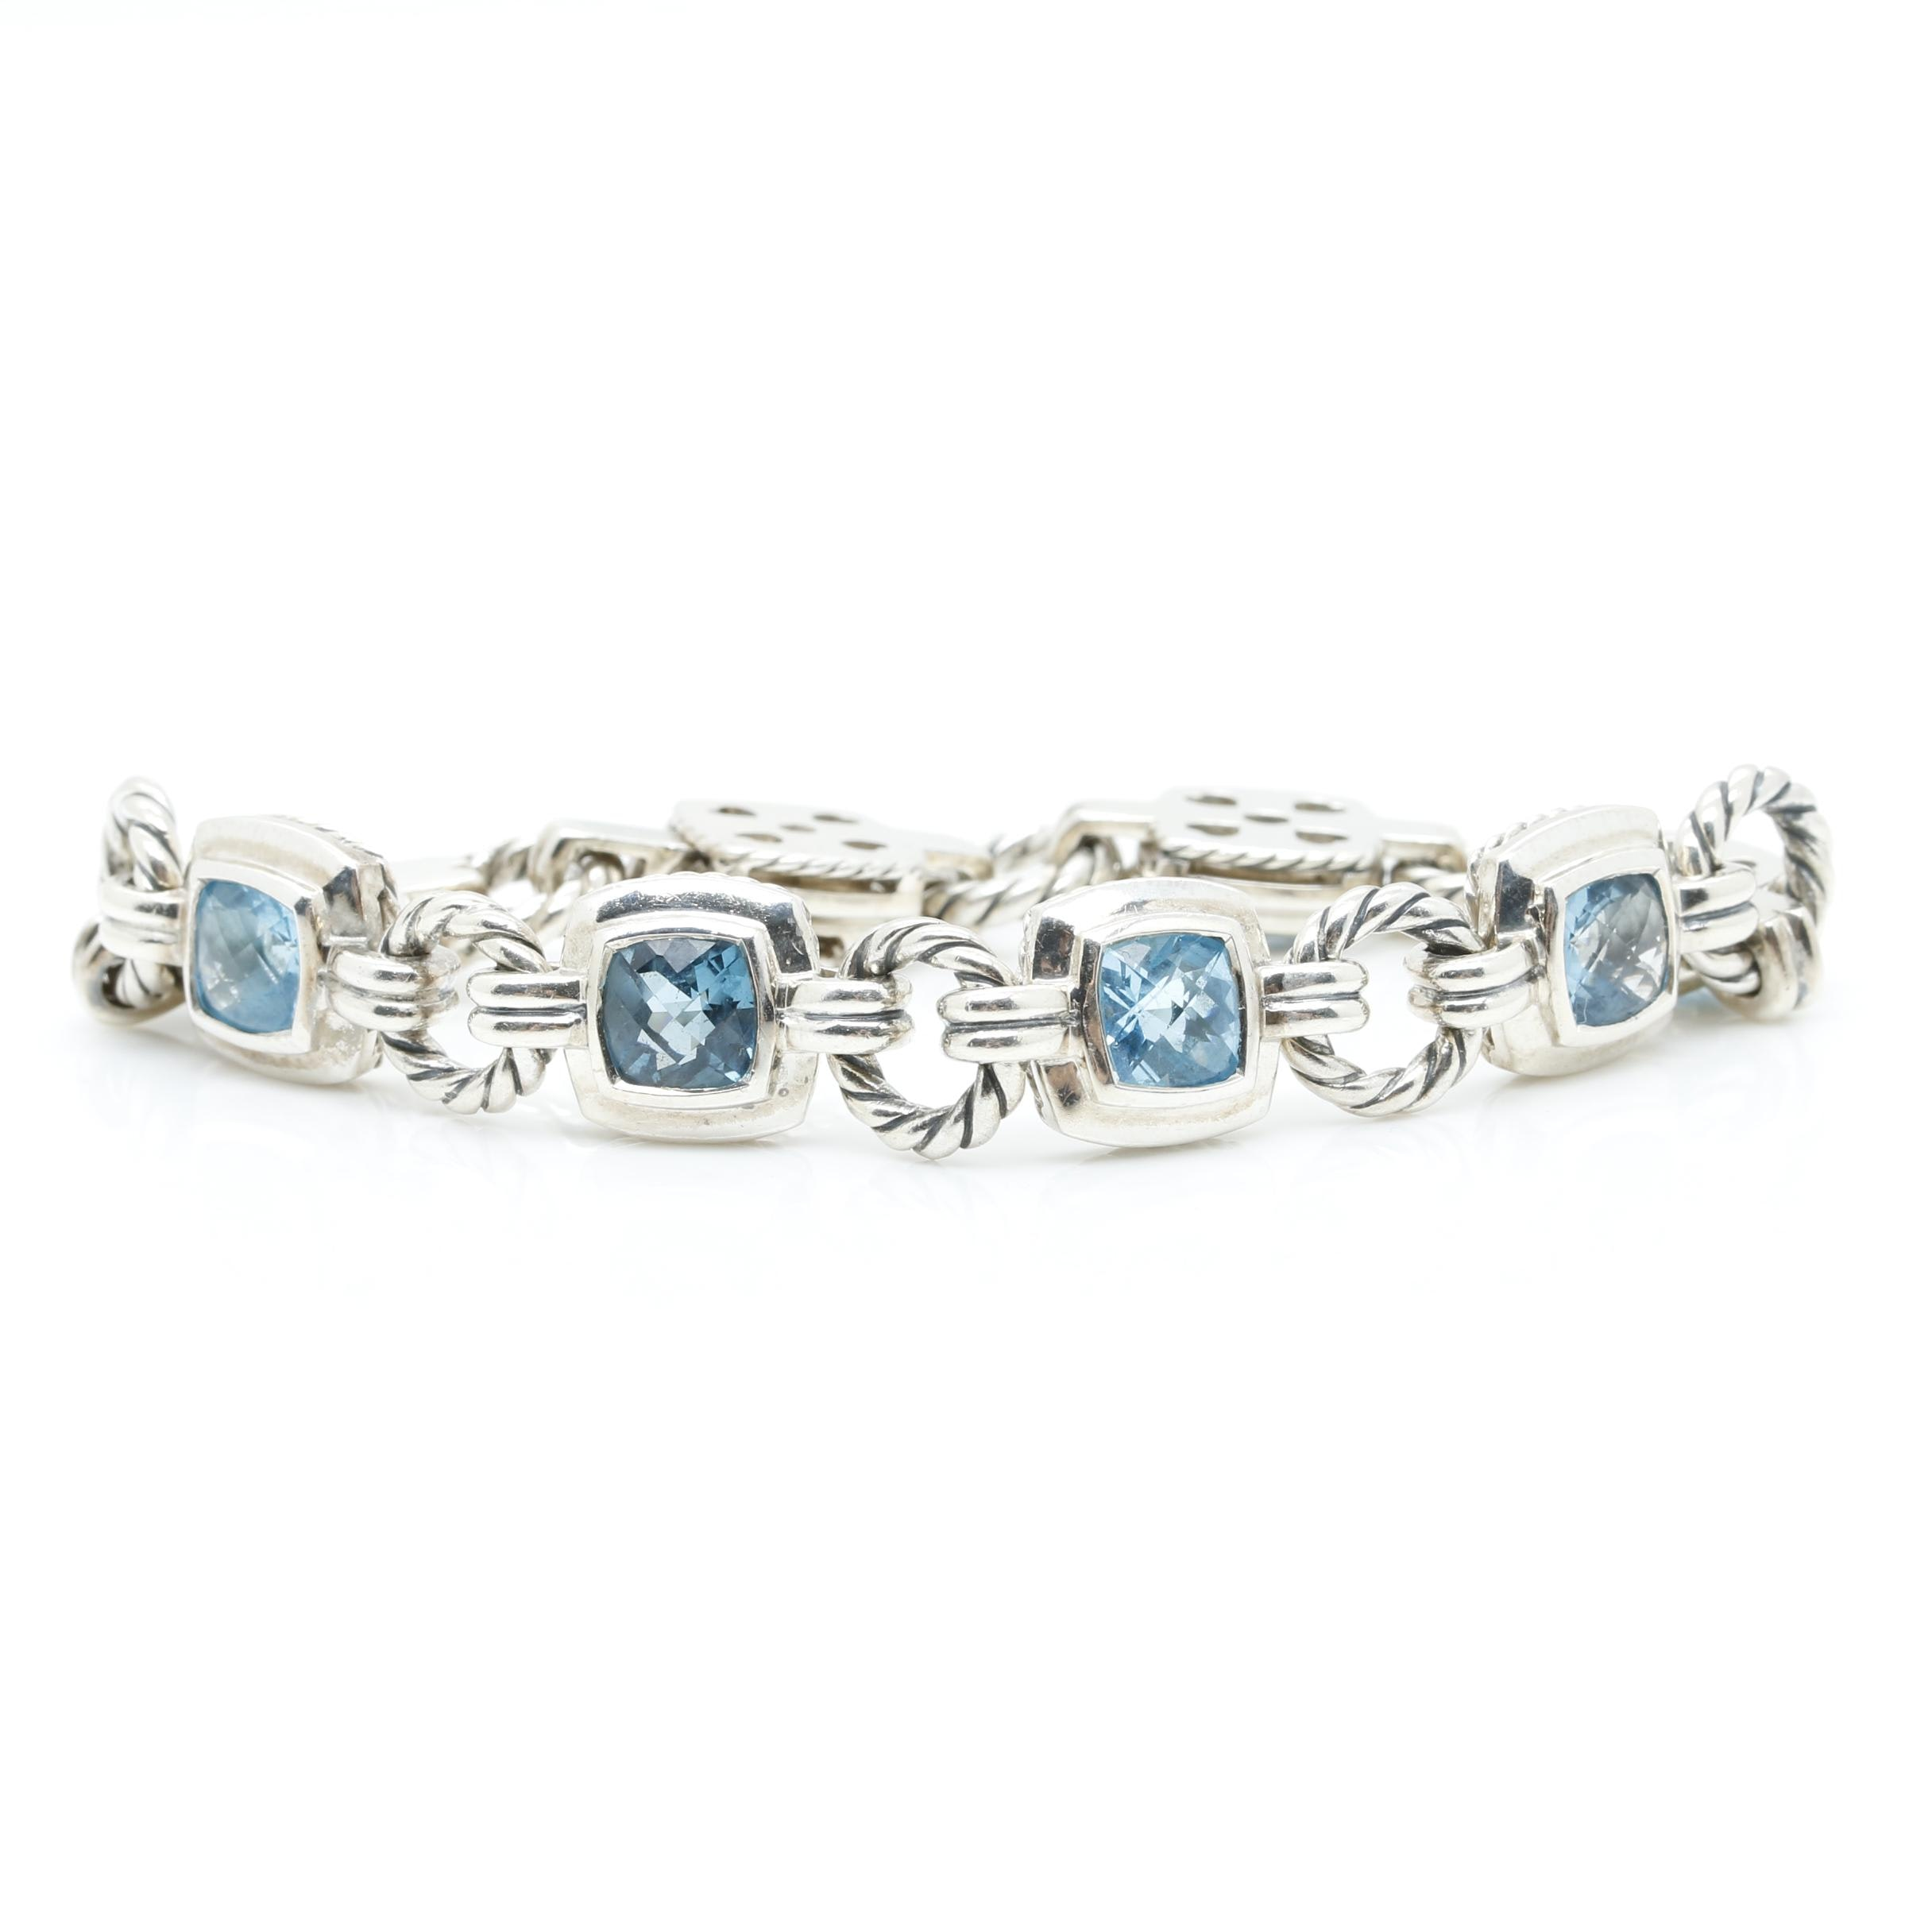 David Yurman Sterling Silver Blue Topaz Bracelet